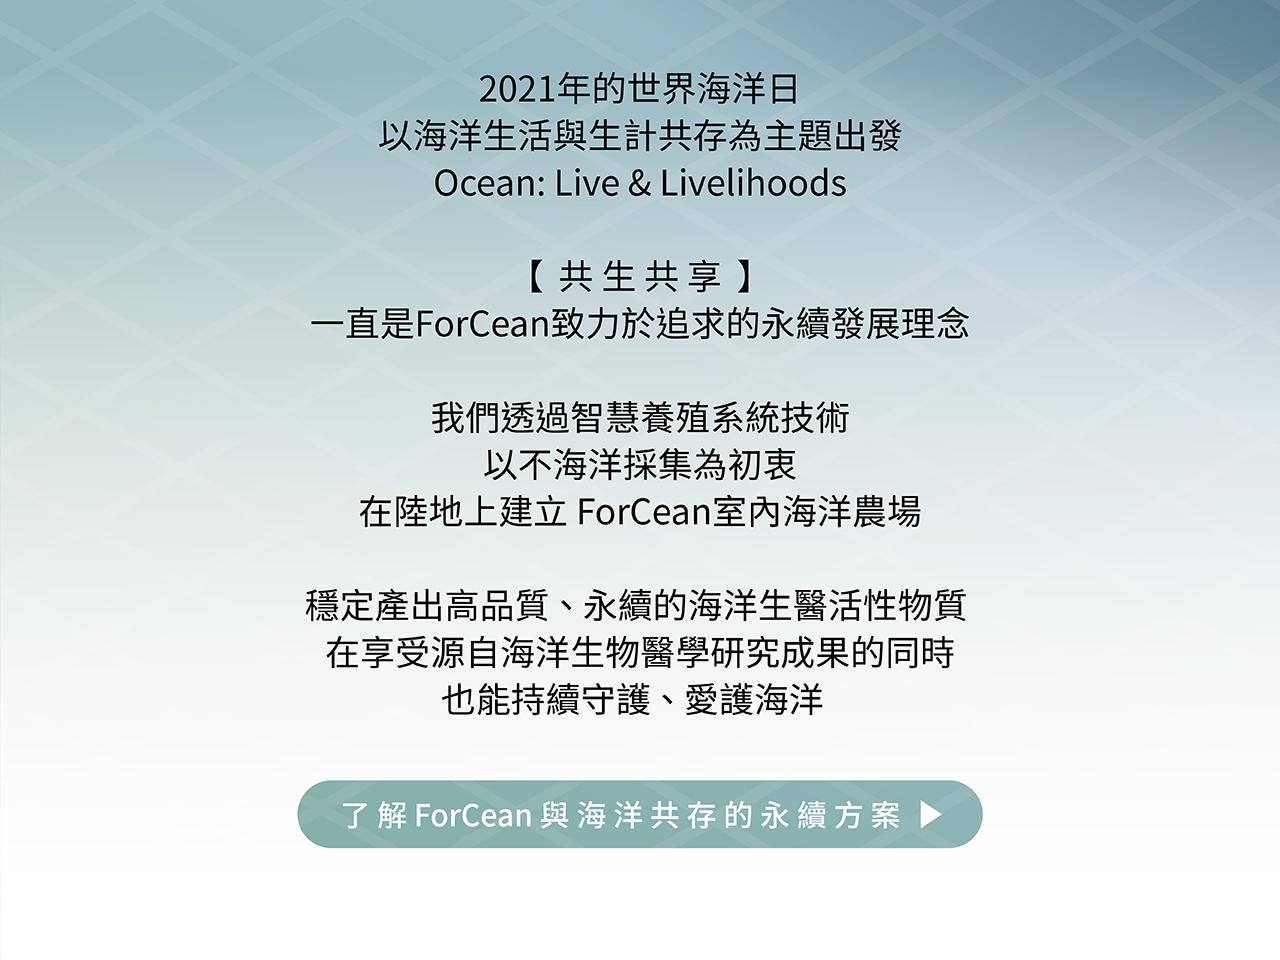 ForCean 世界海洋日 World Oceans Day